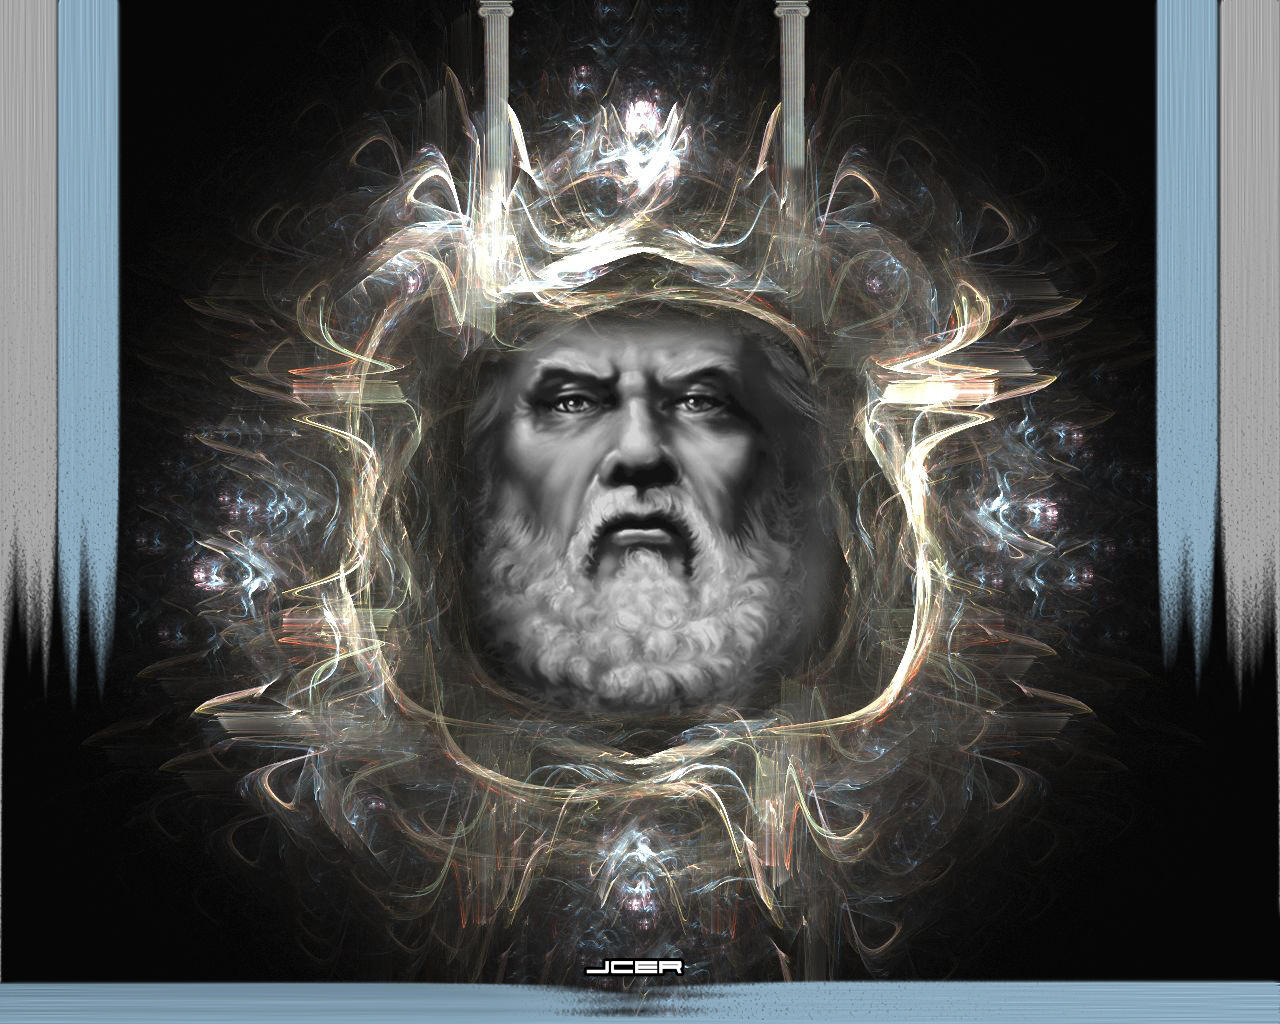 jcer--Wrath of the God... Zeus Digital Painting